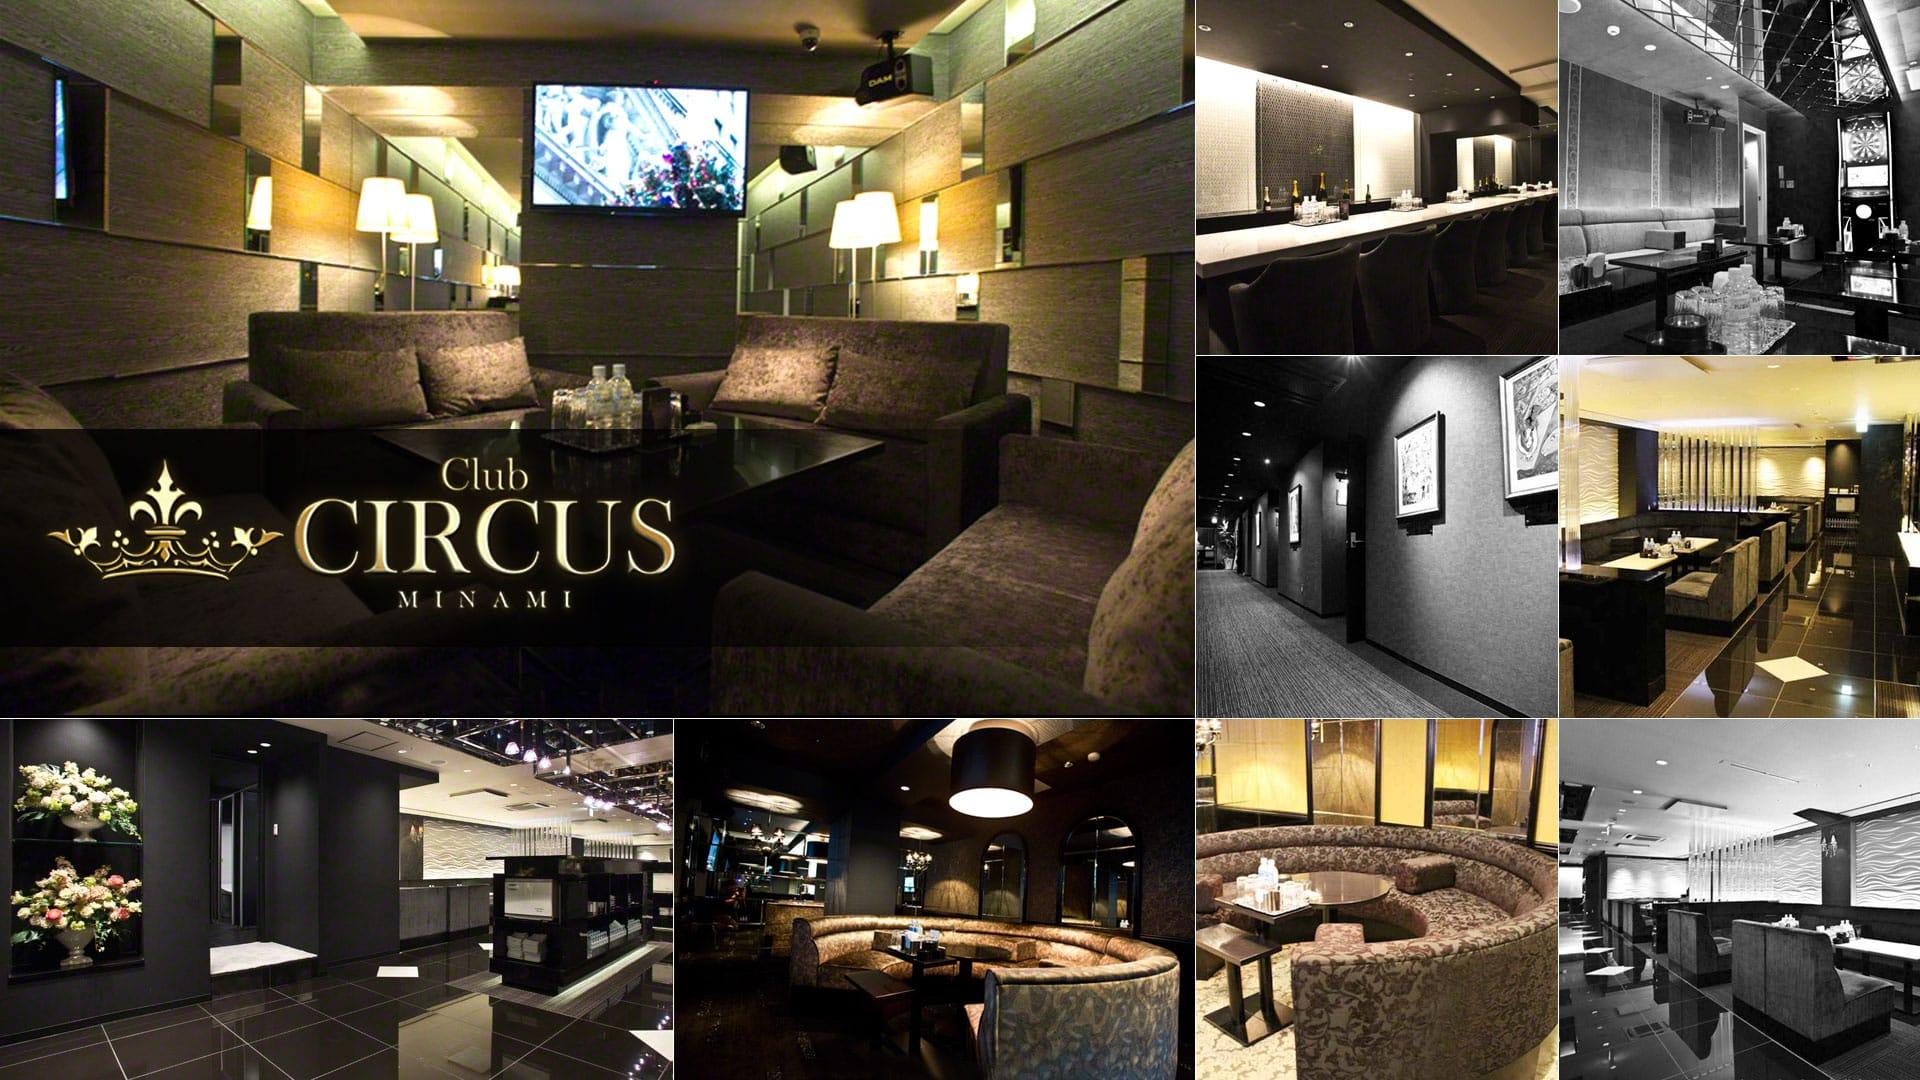 Club CIRCUS(サーカス) TOP画像